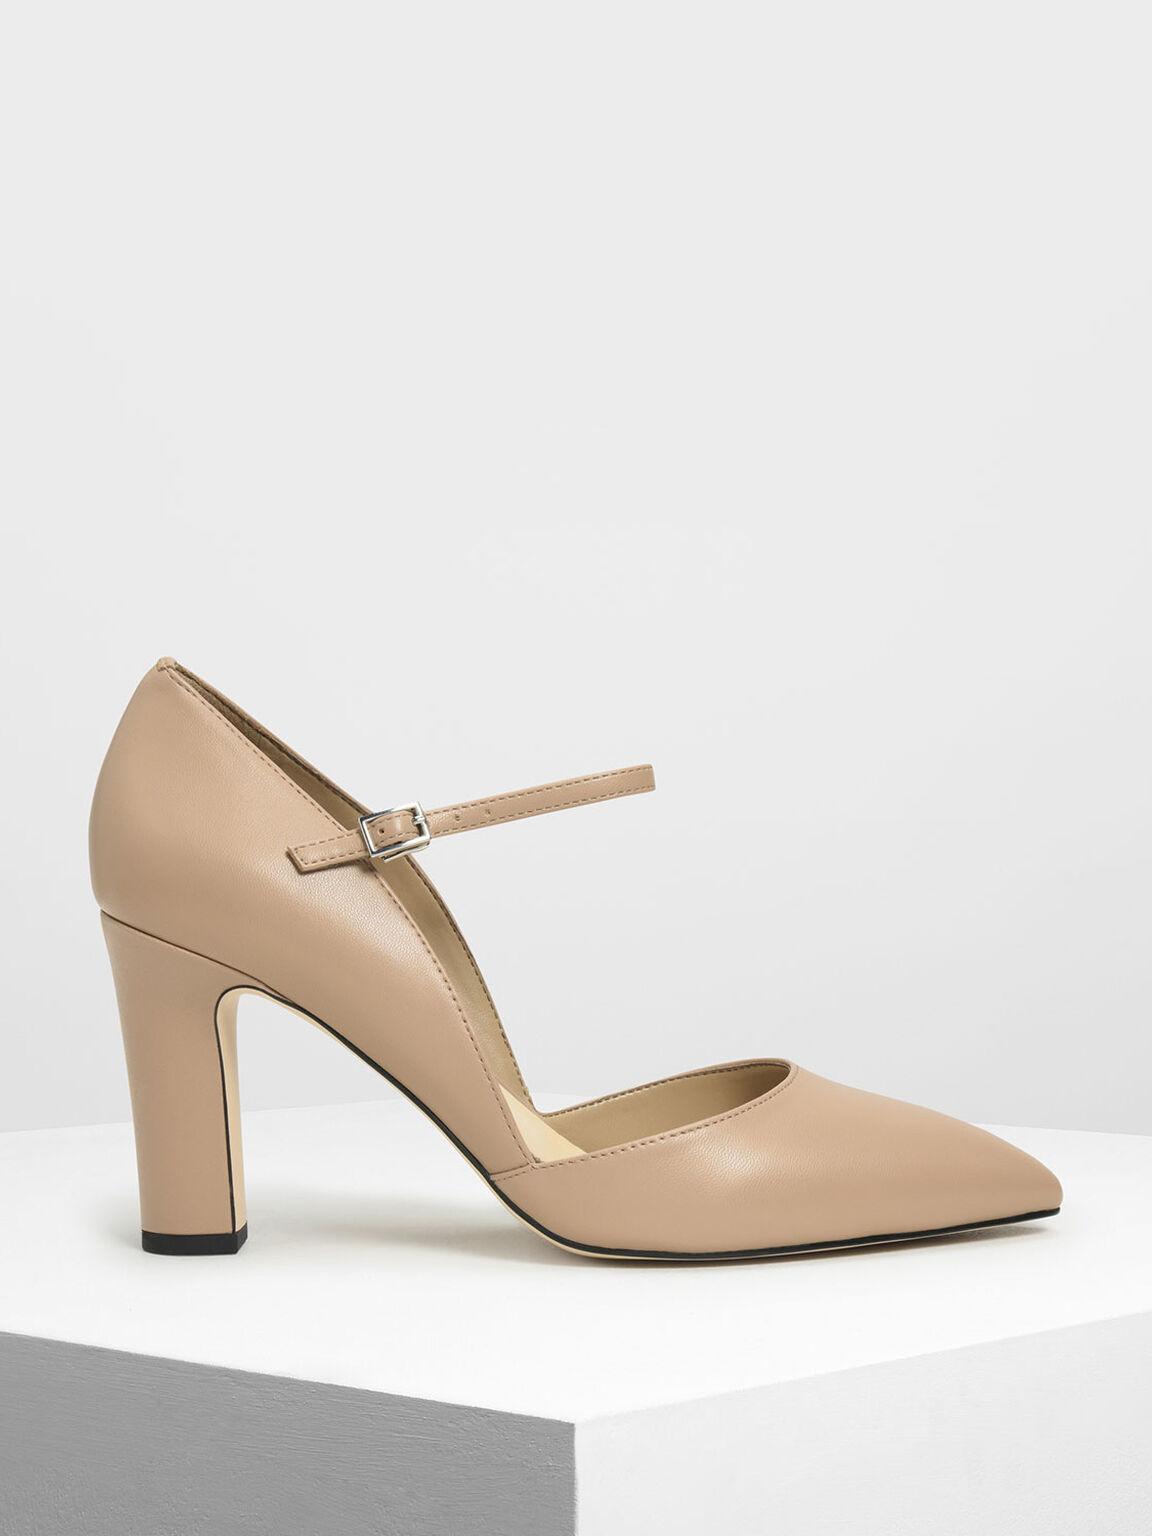 D'Orsay Mary Jane Heels, Camel, hi-res